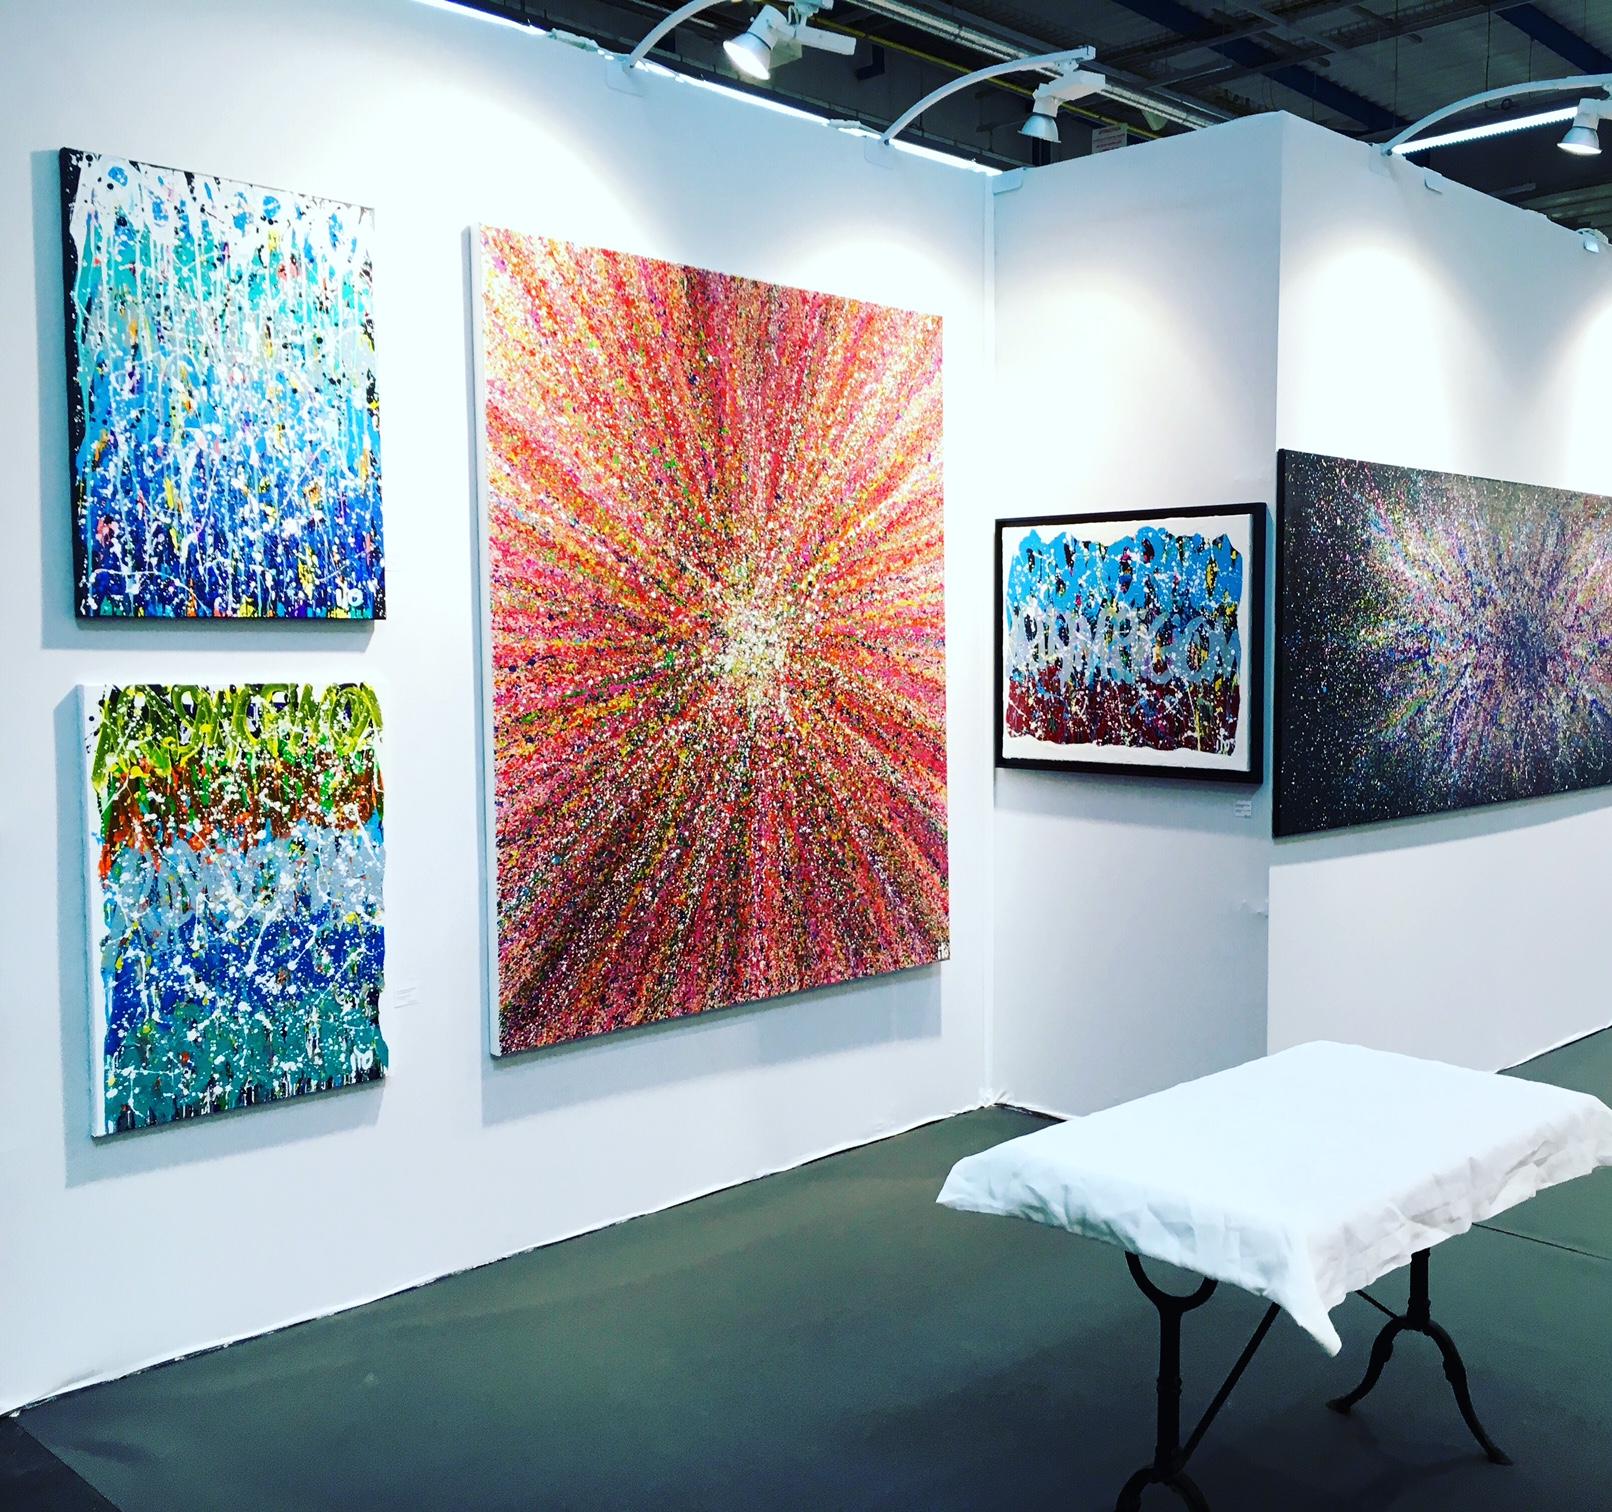 Exhibitions - Ito Dubois